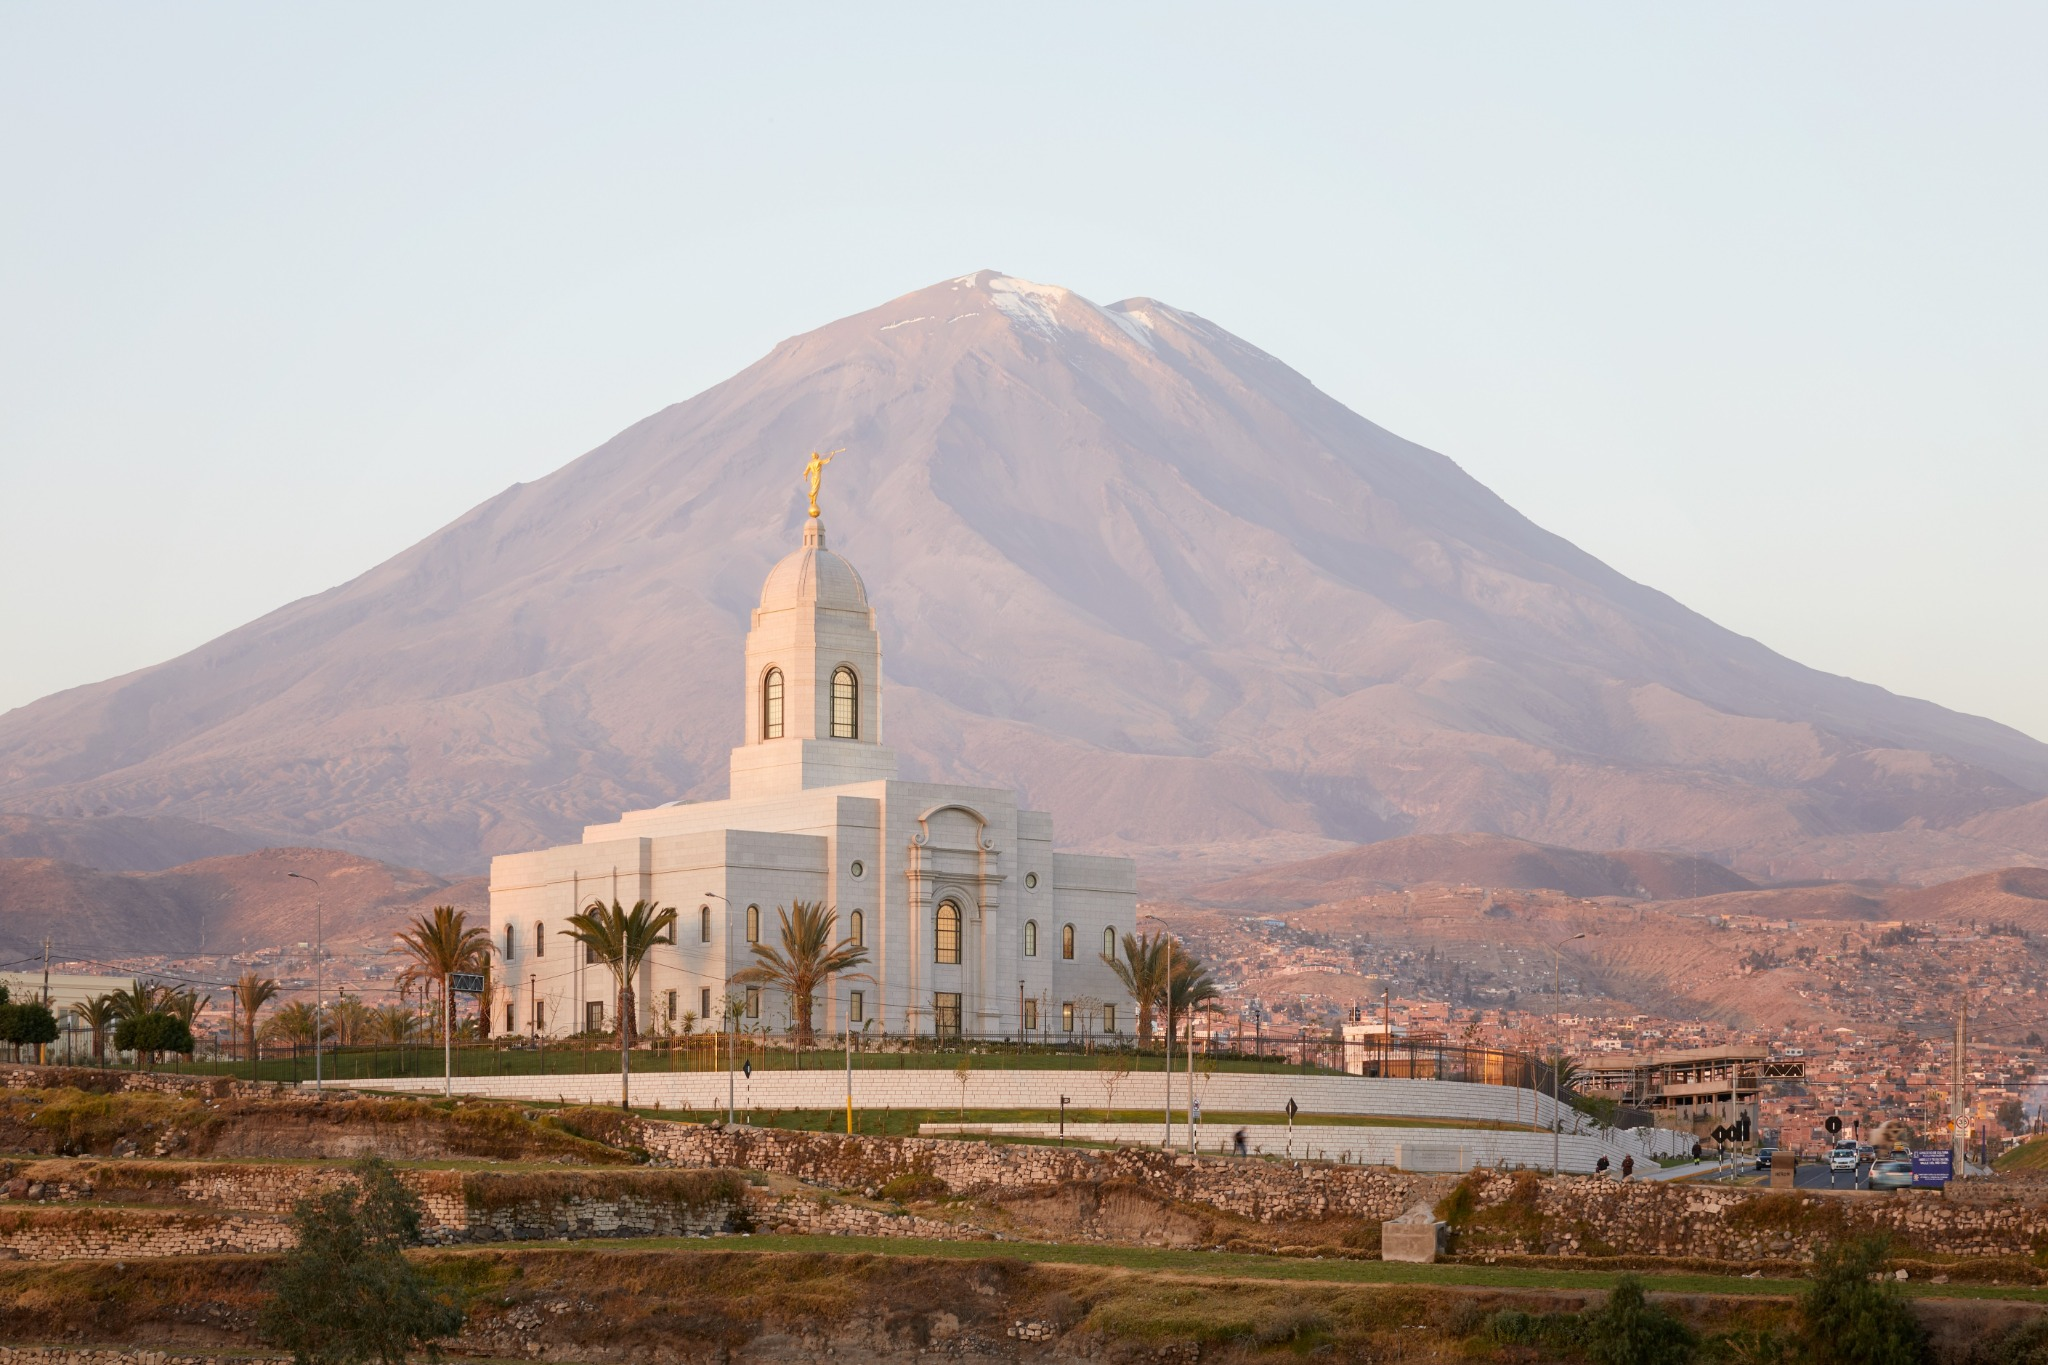 The Arequipa Peru Temple.